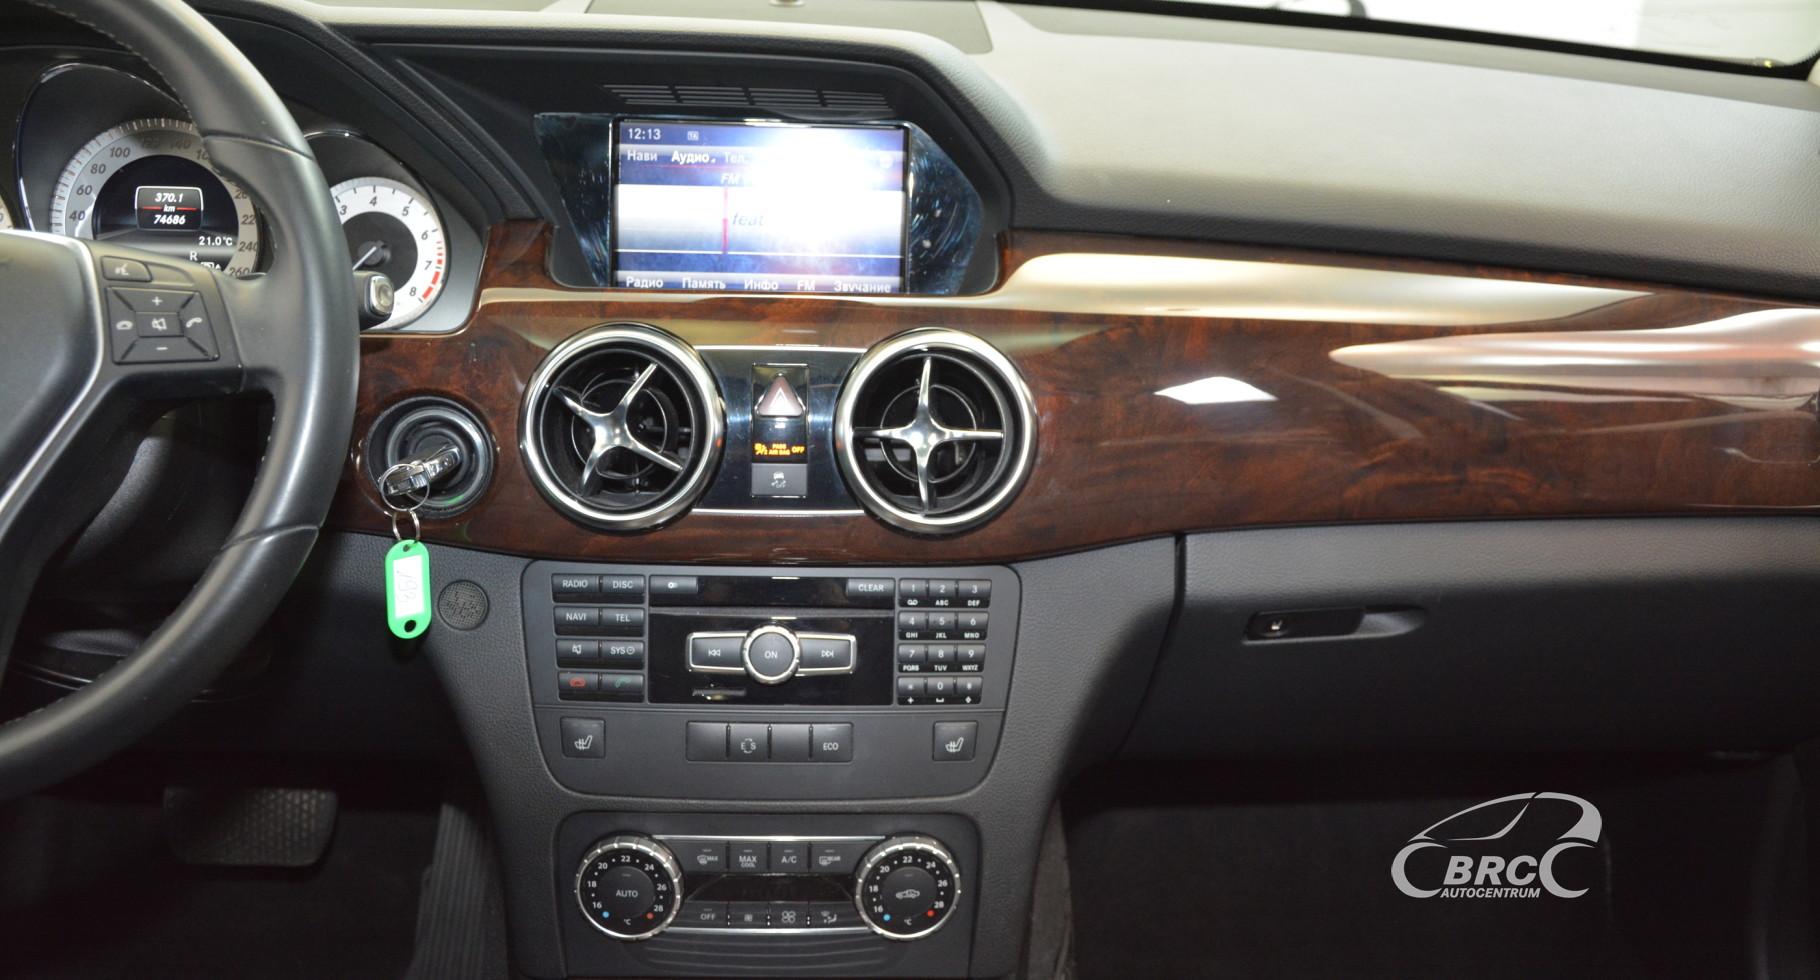 Mercedes-Benz GLK 350 Automatas